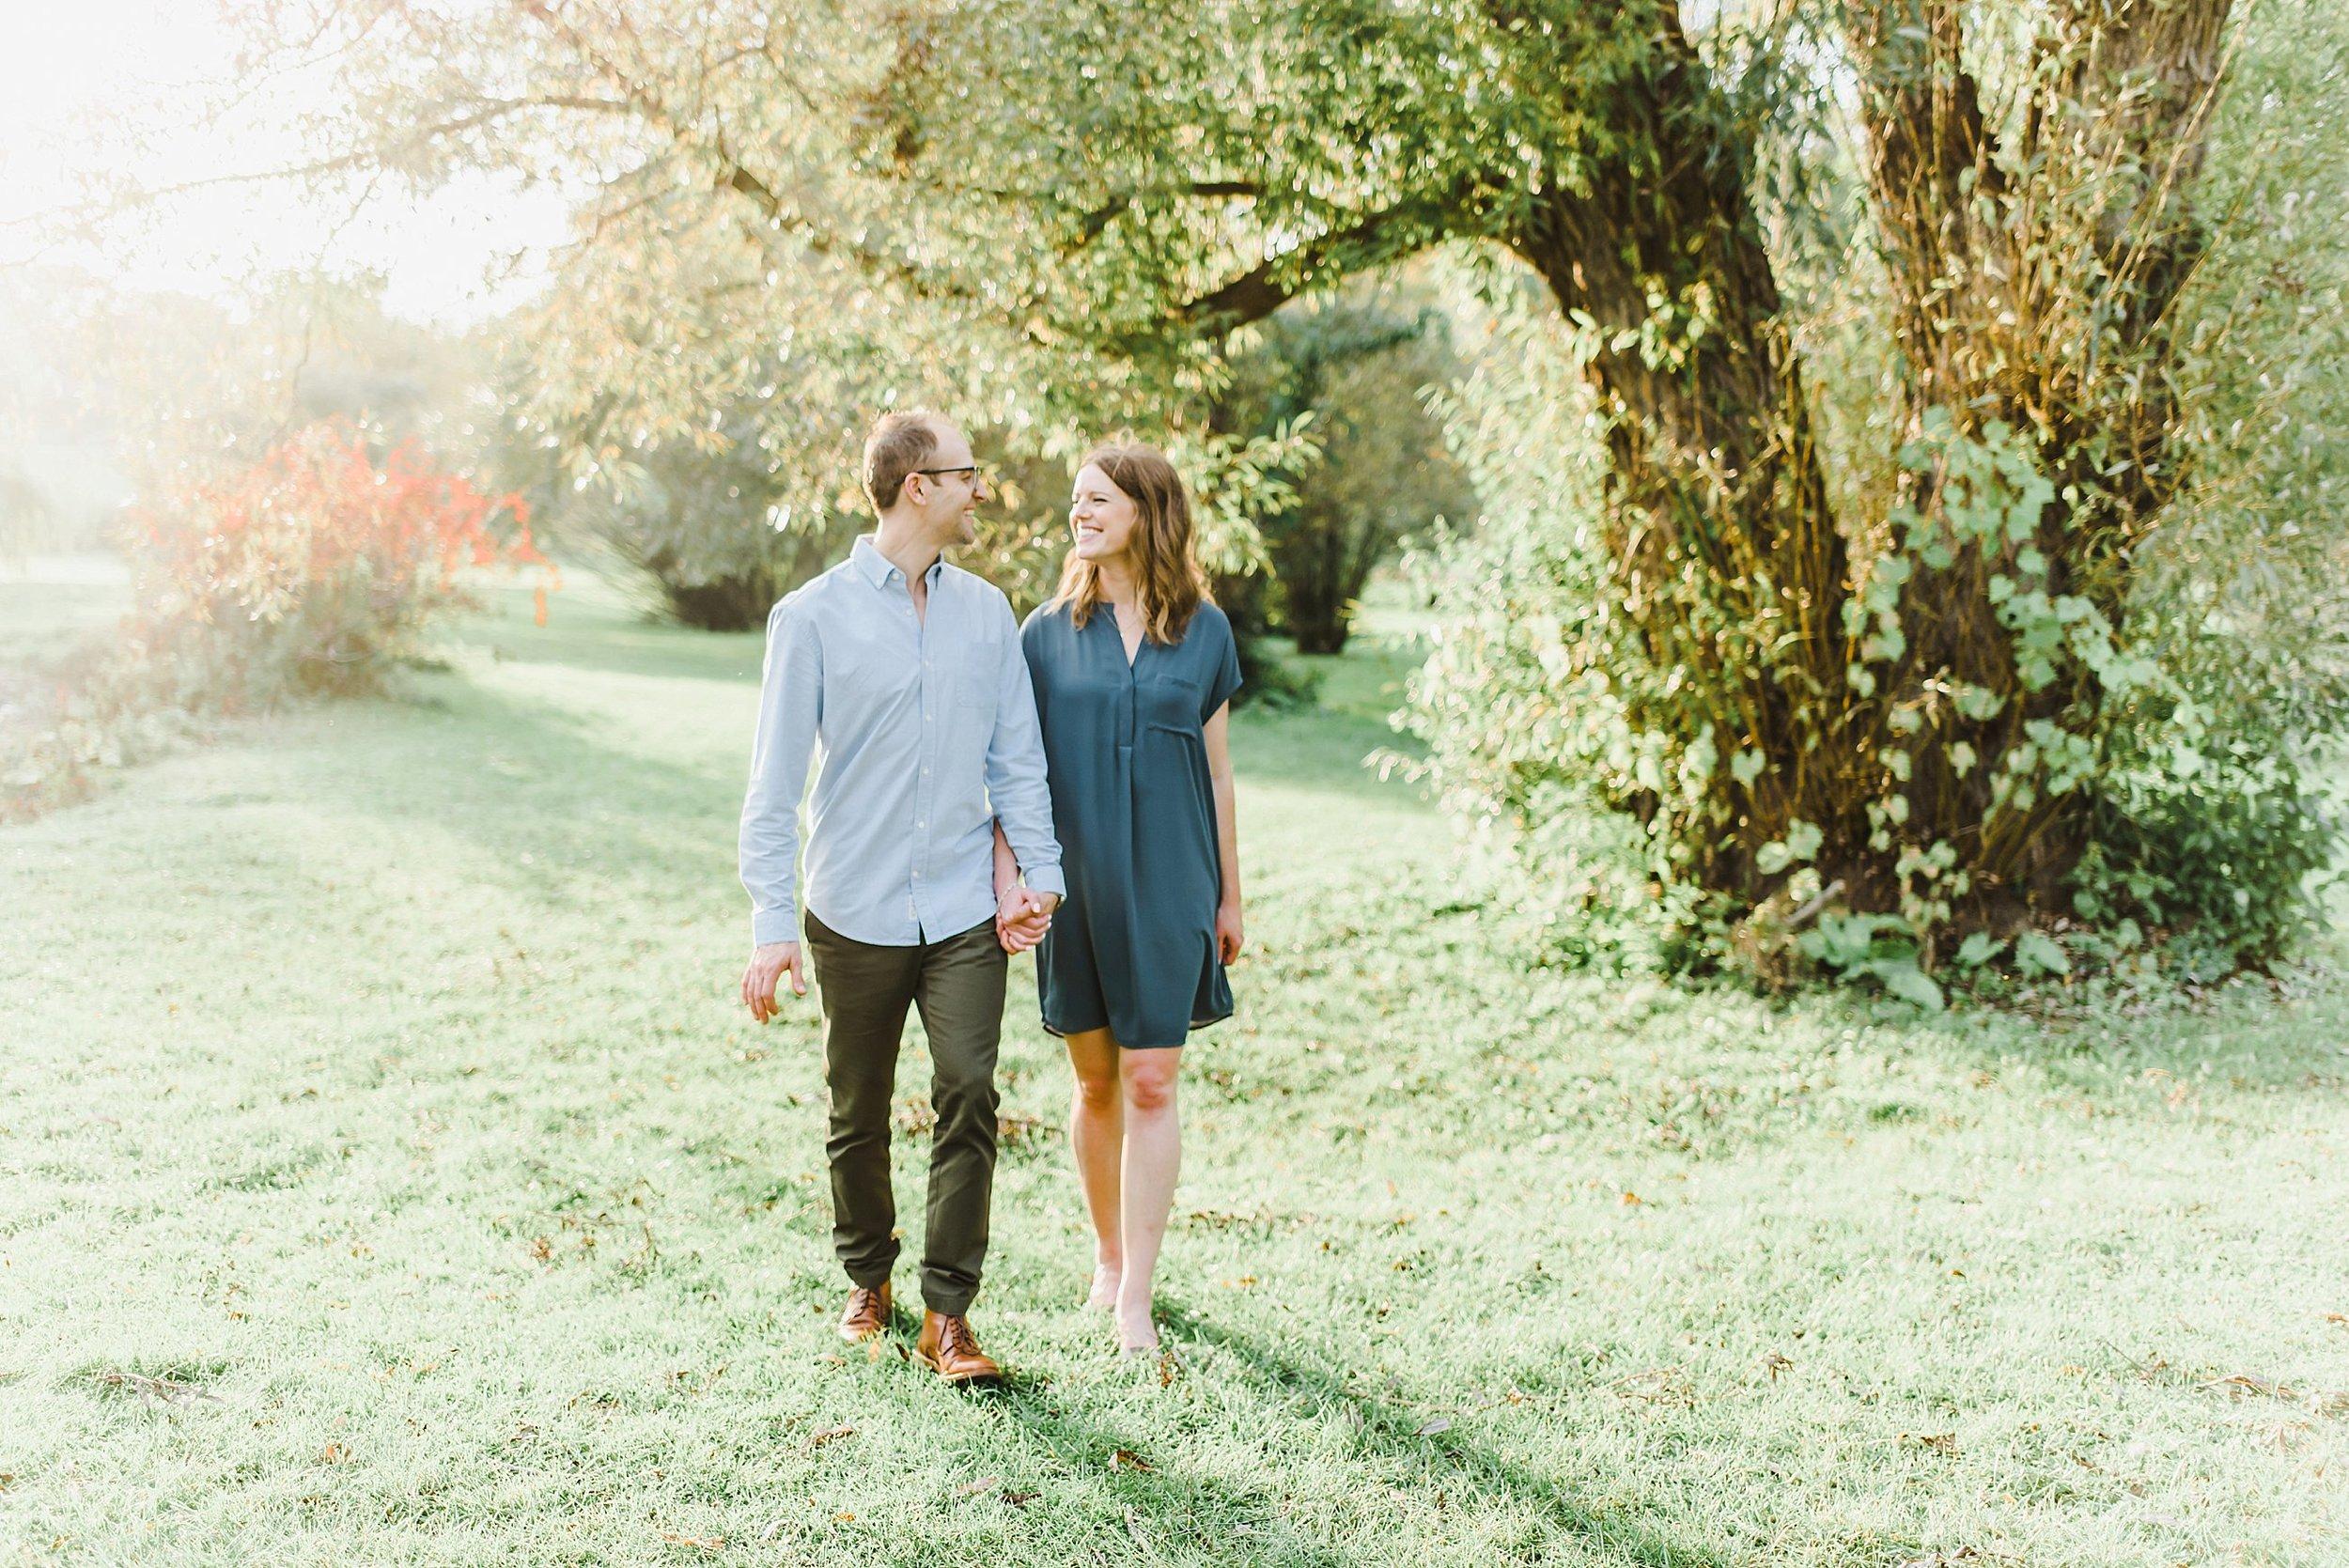 light airy indie fine art ottawa wedding photographer | Ali and Batoul Photography_1424.jpg